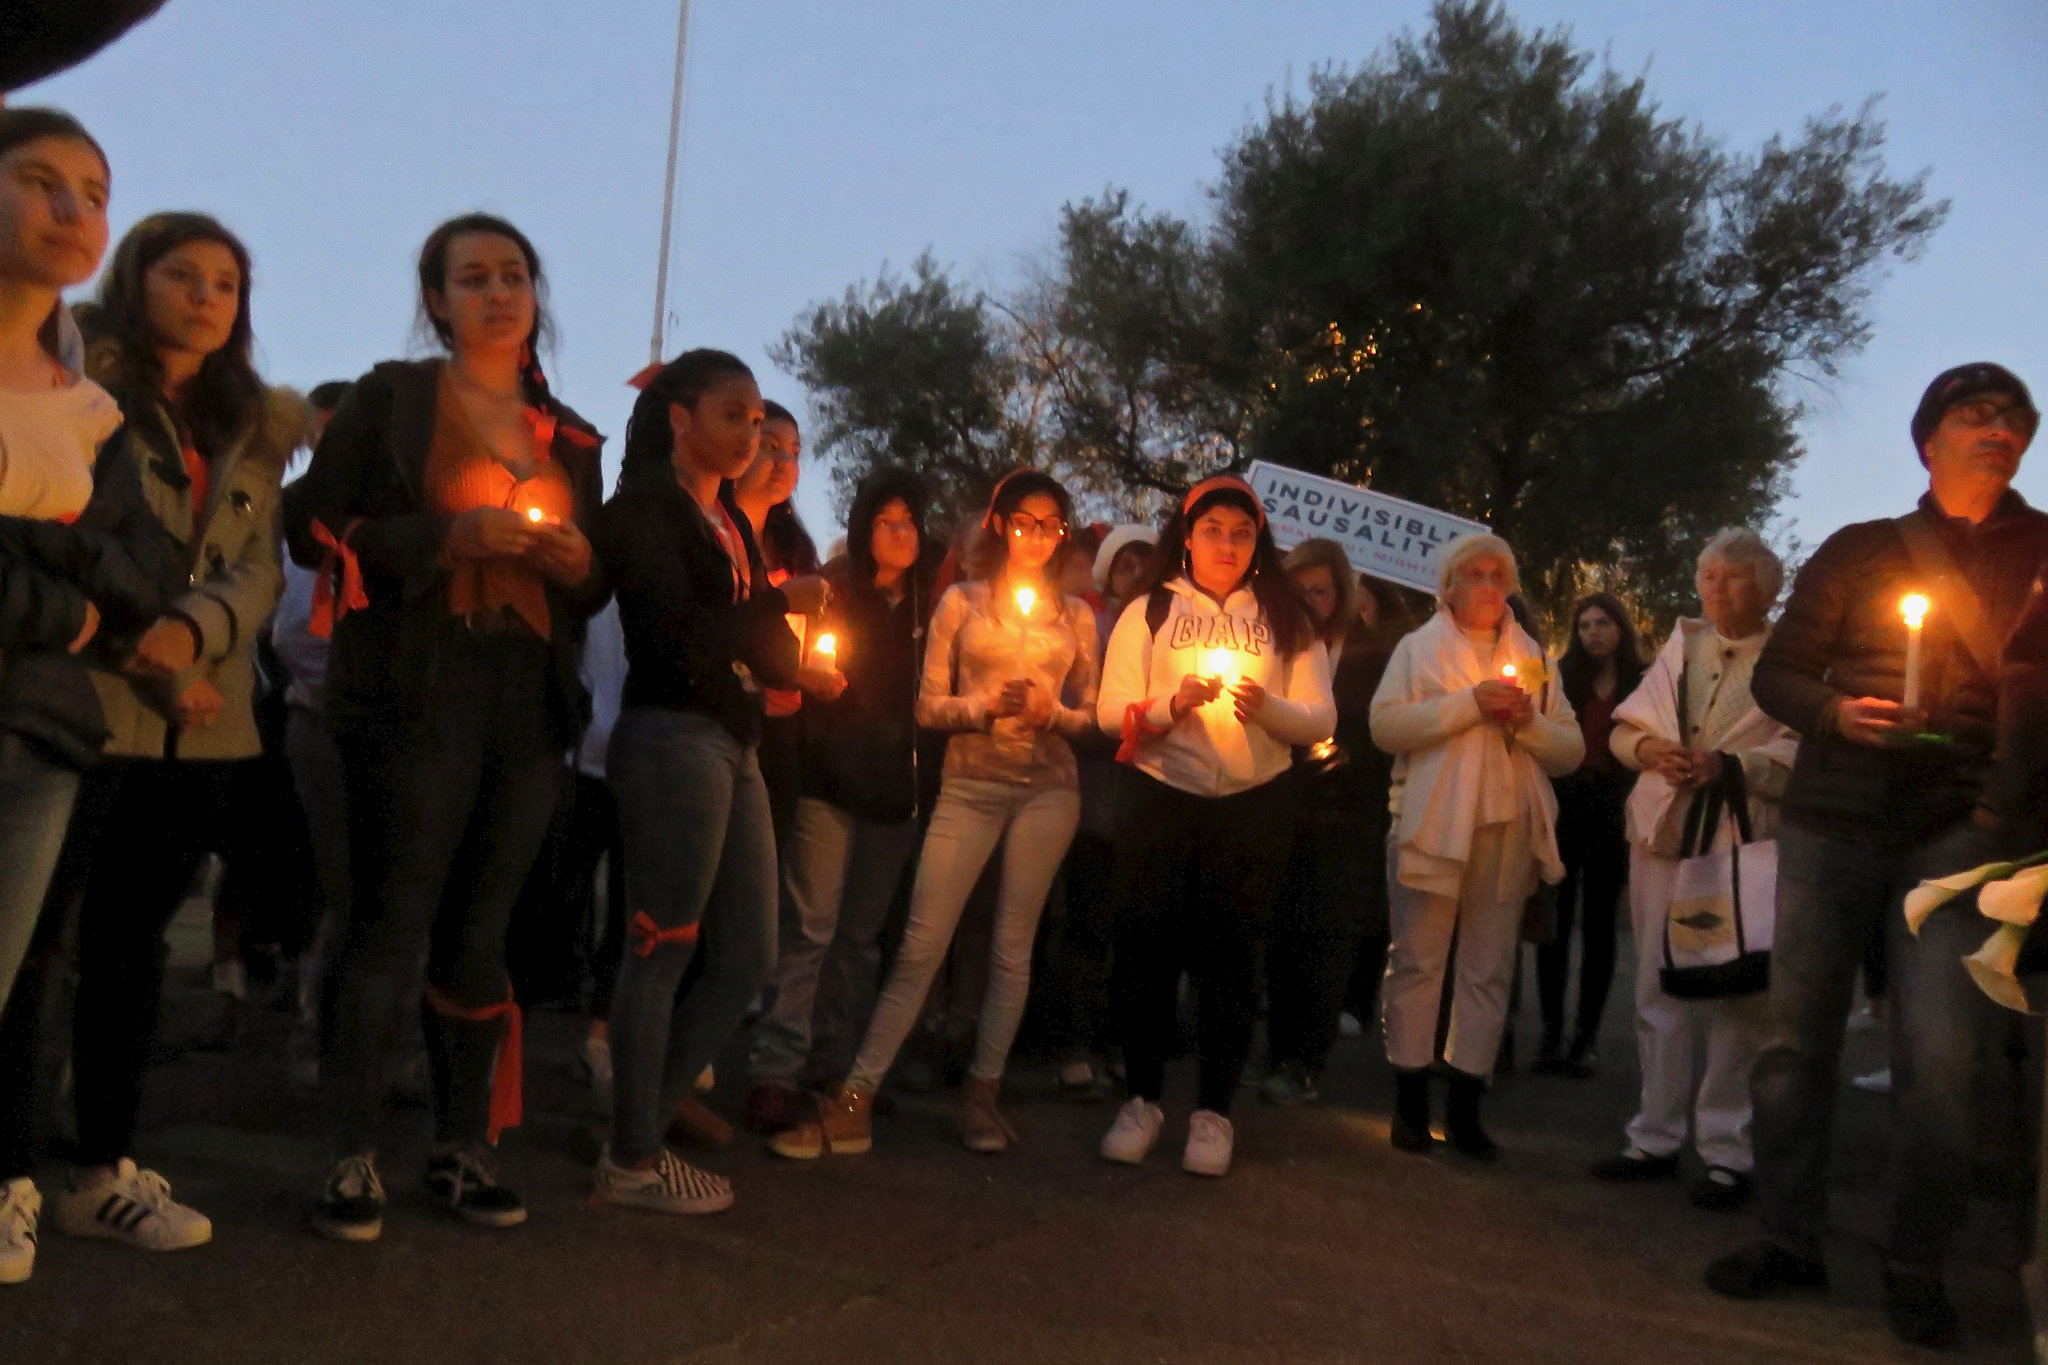 School shootings: Impacts on student achievement, enrollment